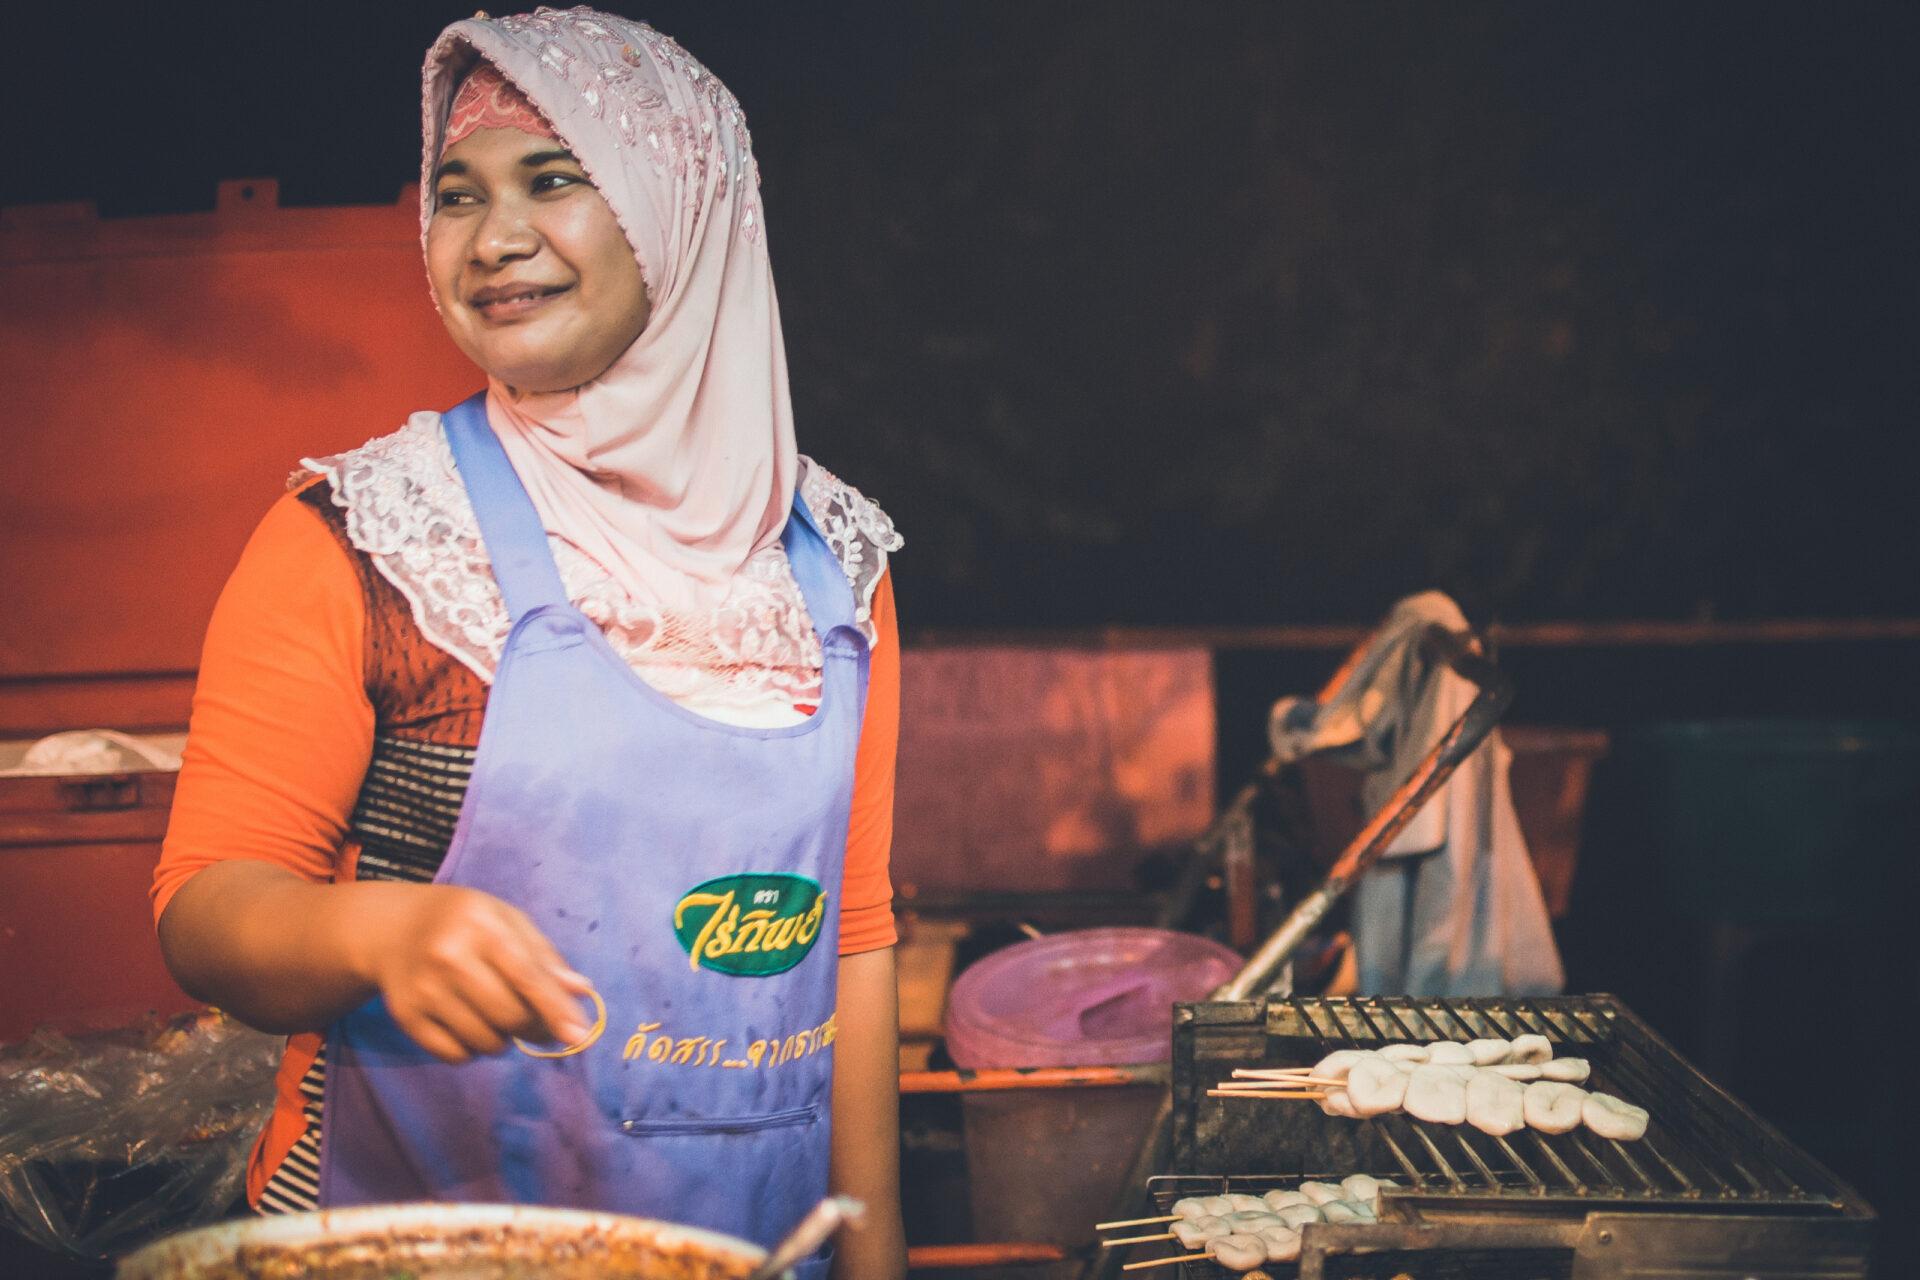 Night markets inThailand